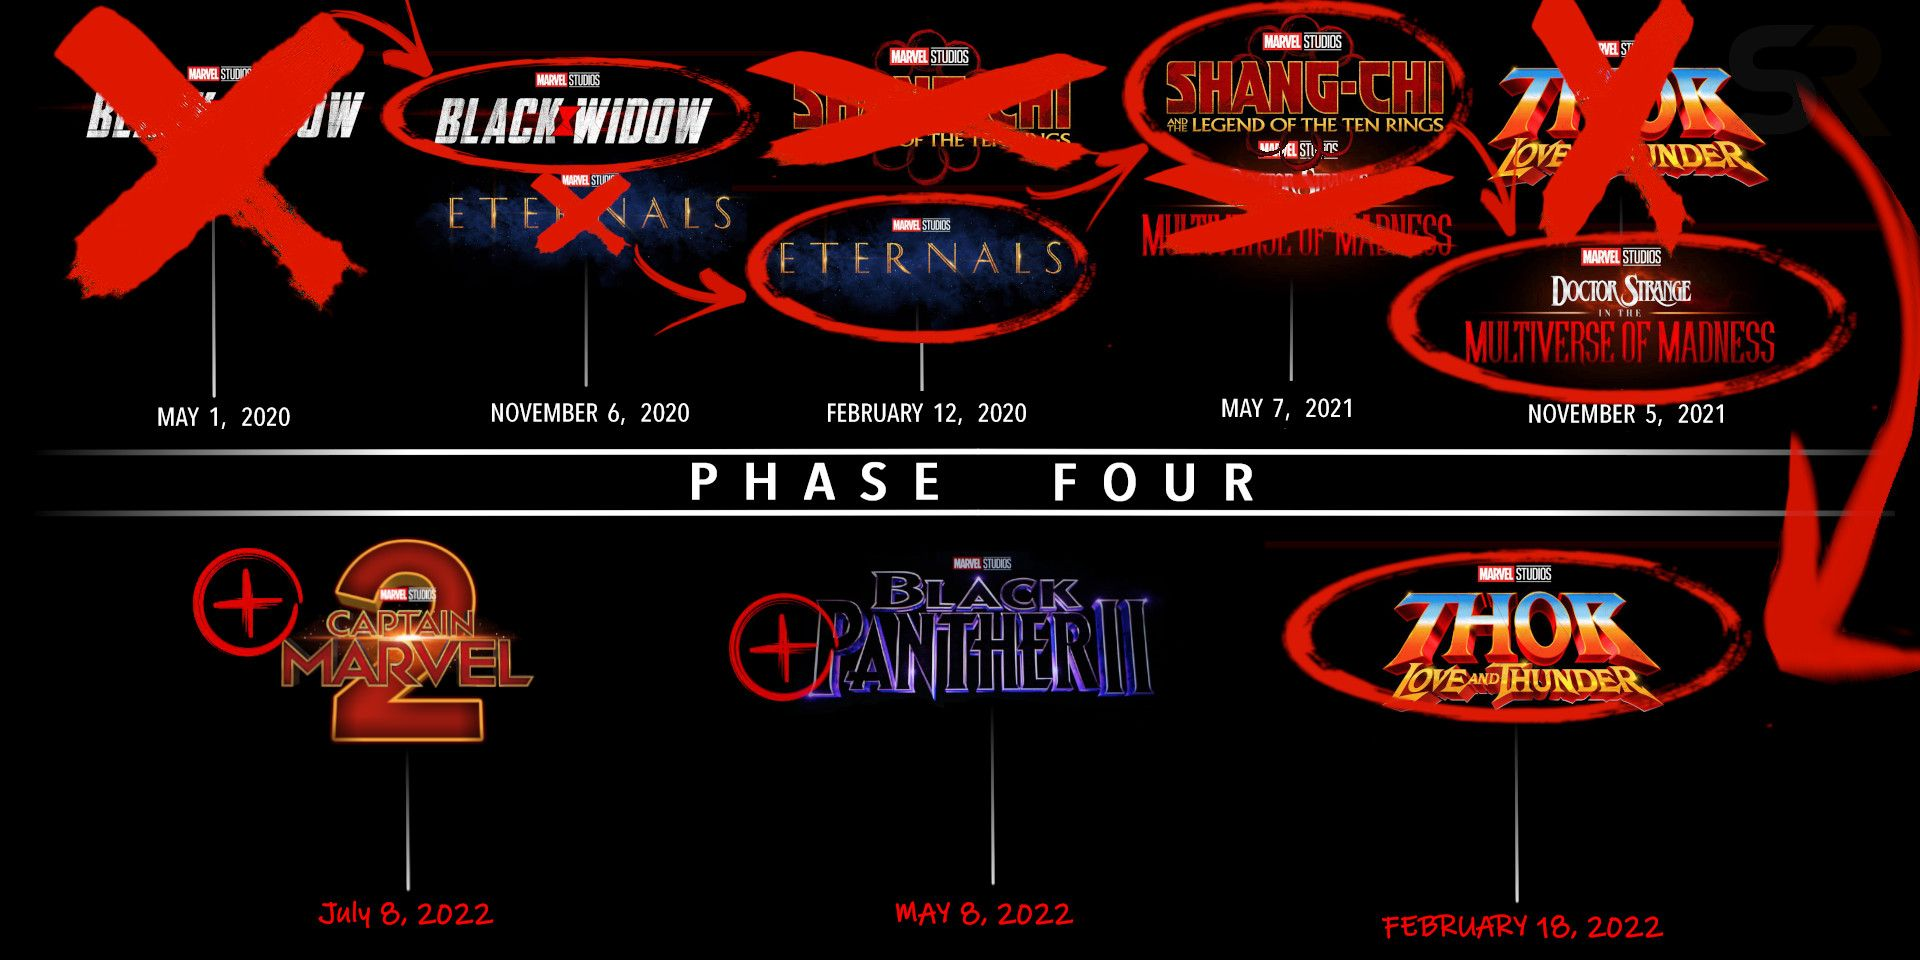 MCU Phase 4 Movie Timeline